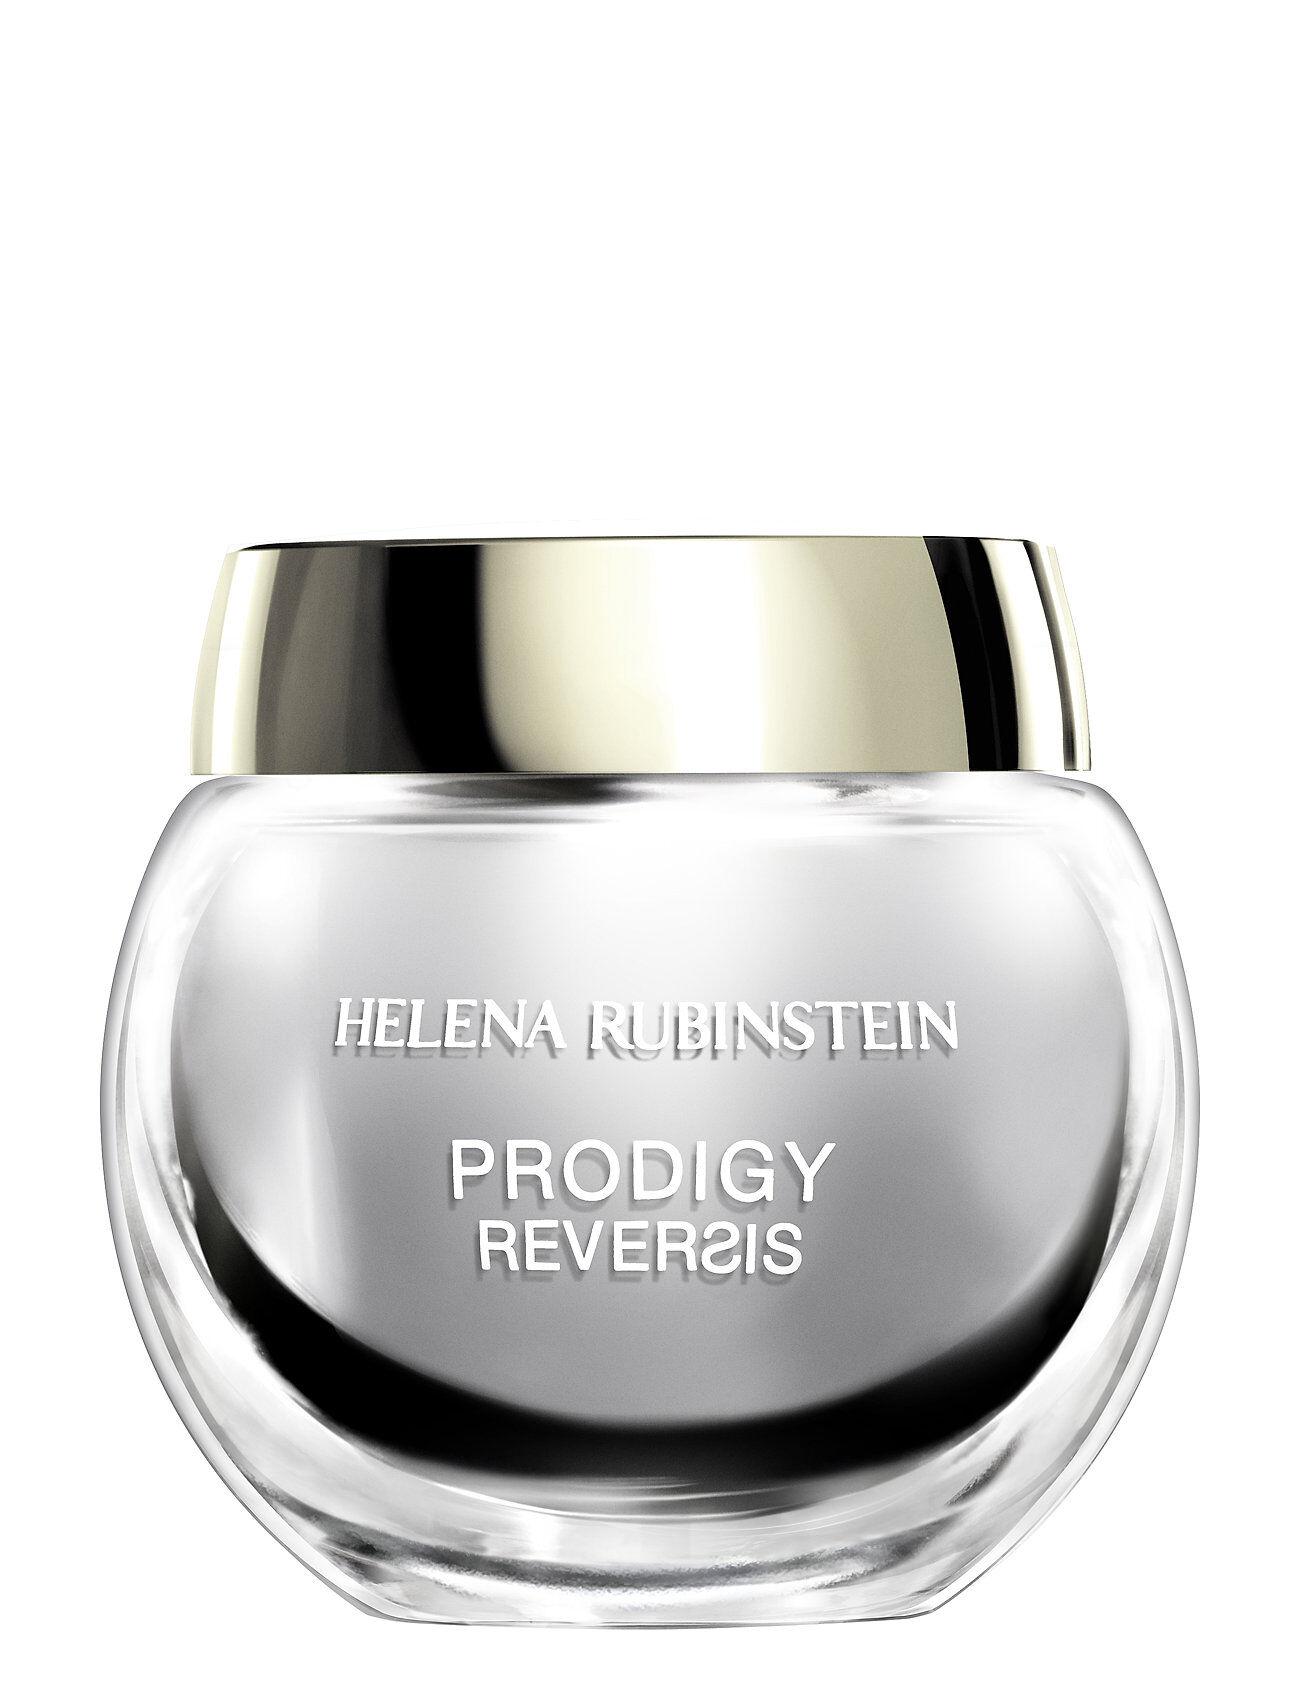 Helena Rubinstein Prodigy Reversis Creme Normal/Dry Skin 50 Ml